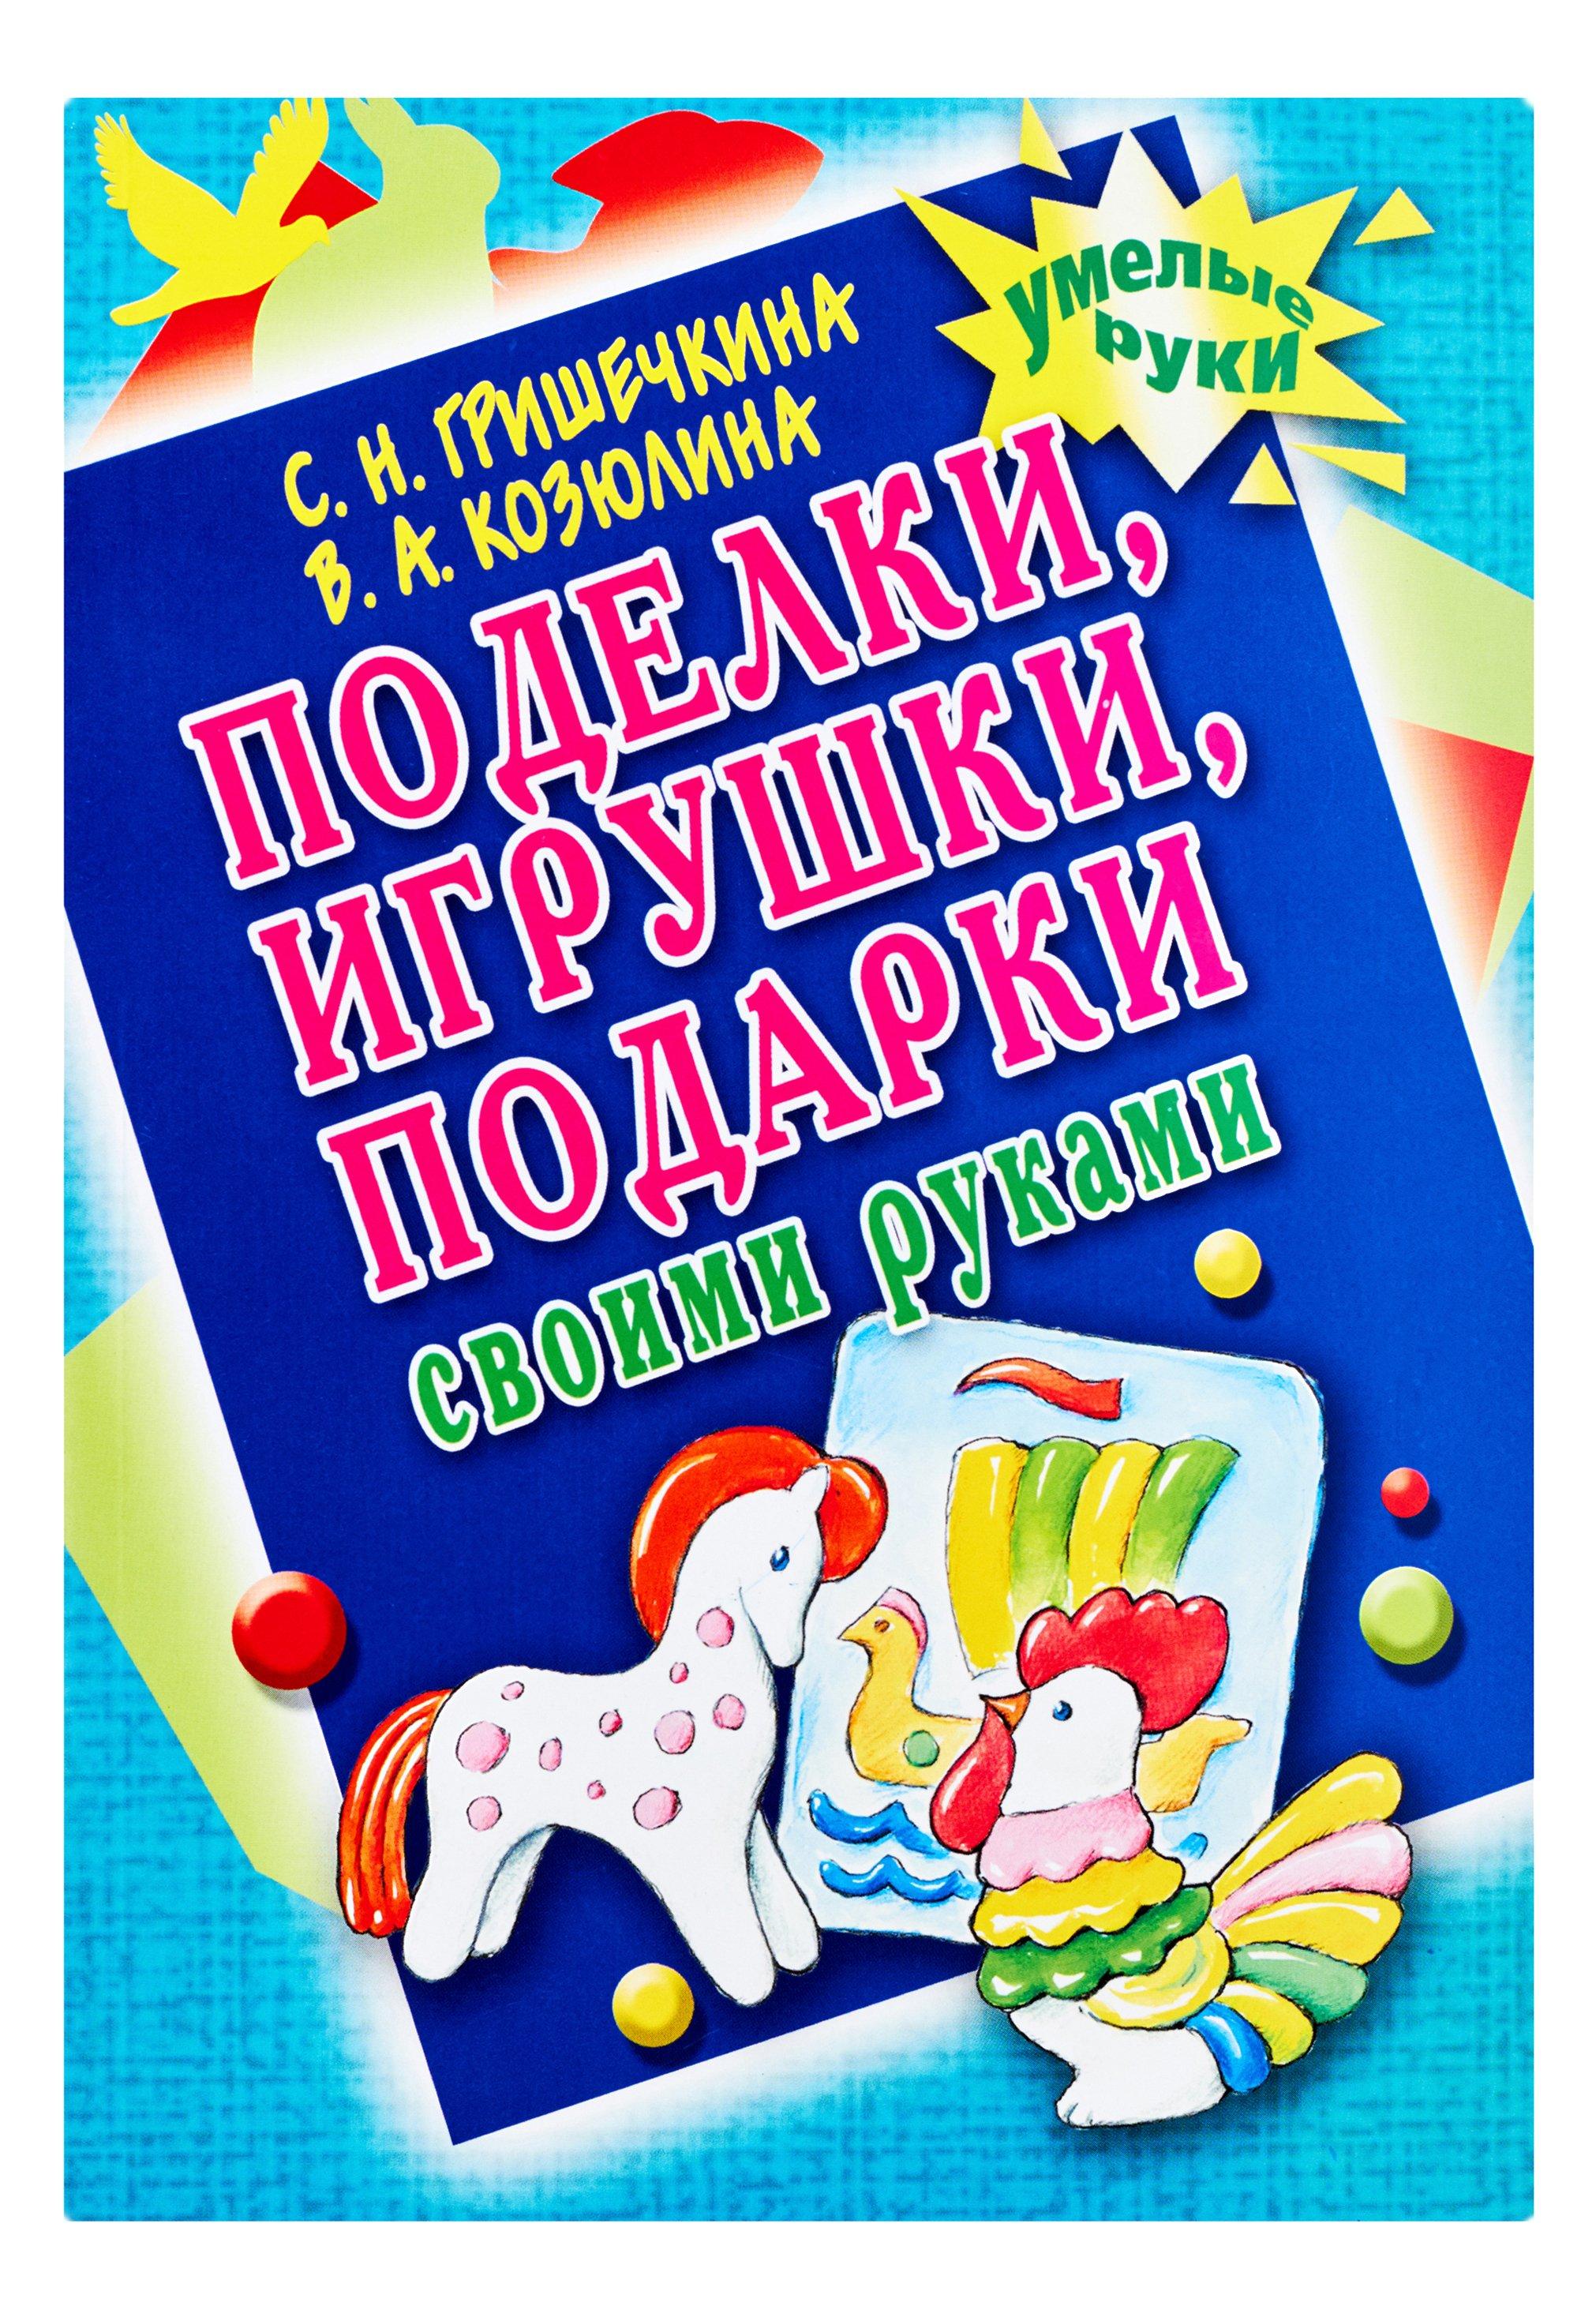 Гришечкина Наталья Васильевна Поделки, игрушки, подарки своими руками